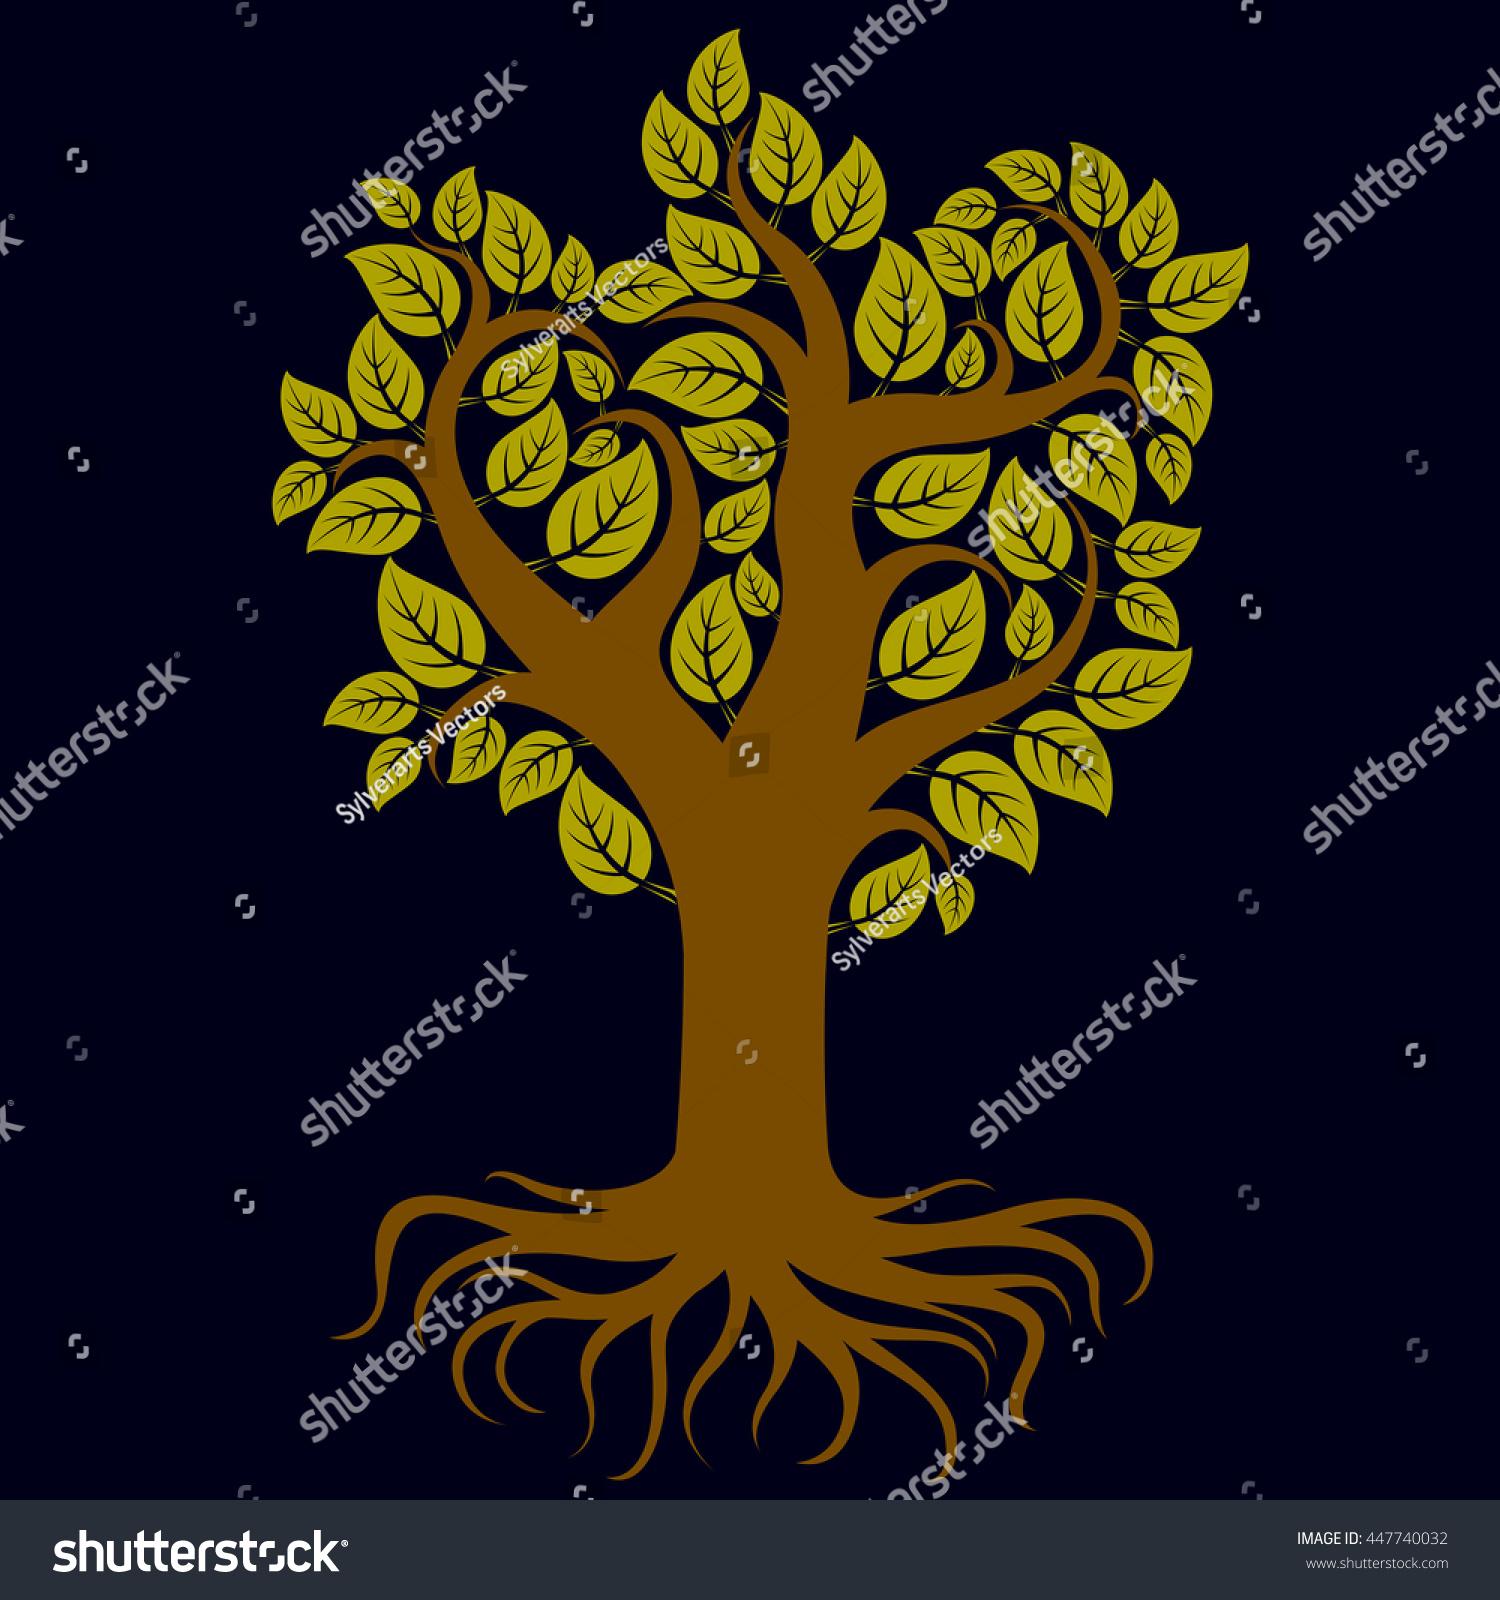 Vector Art Illustration Branchy Tree Strong Stock Vector Royalty